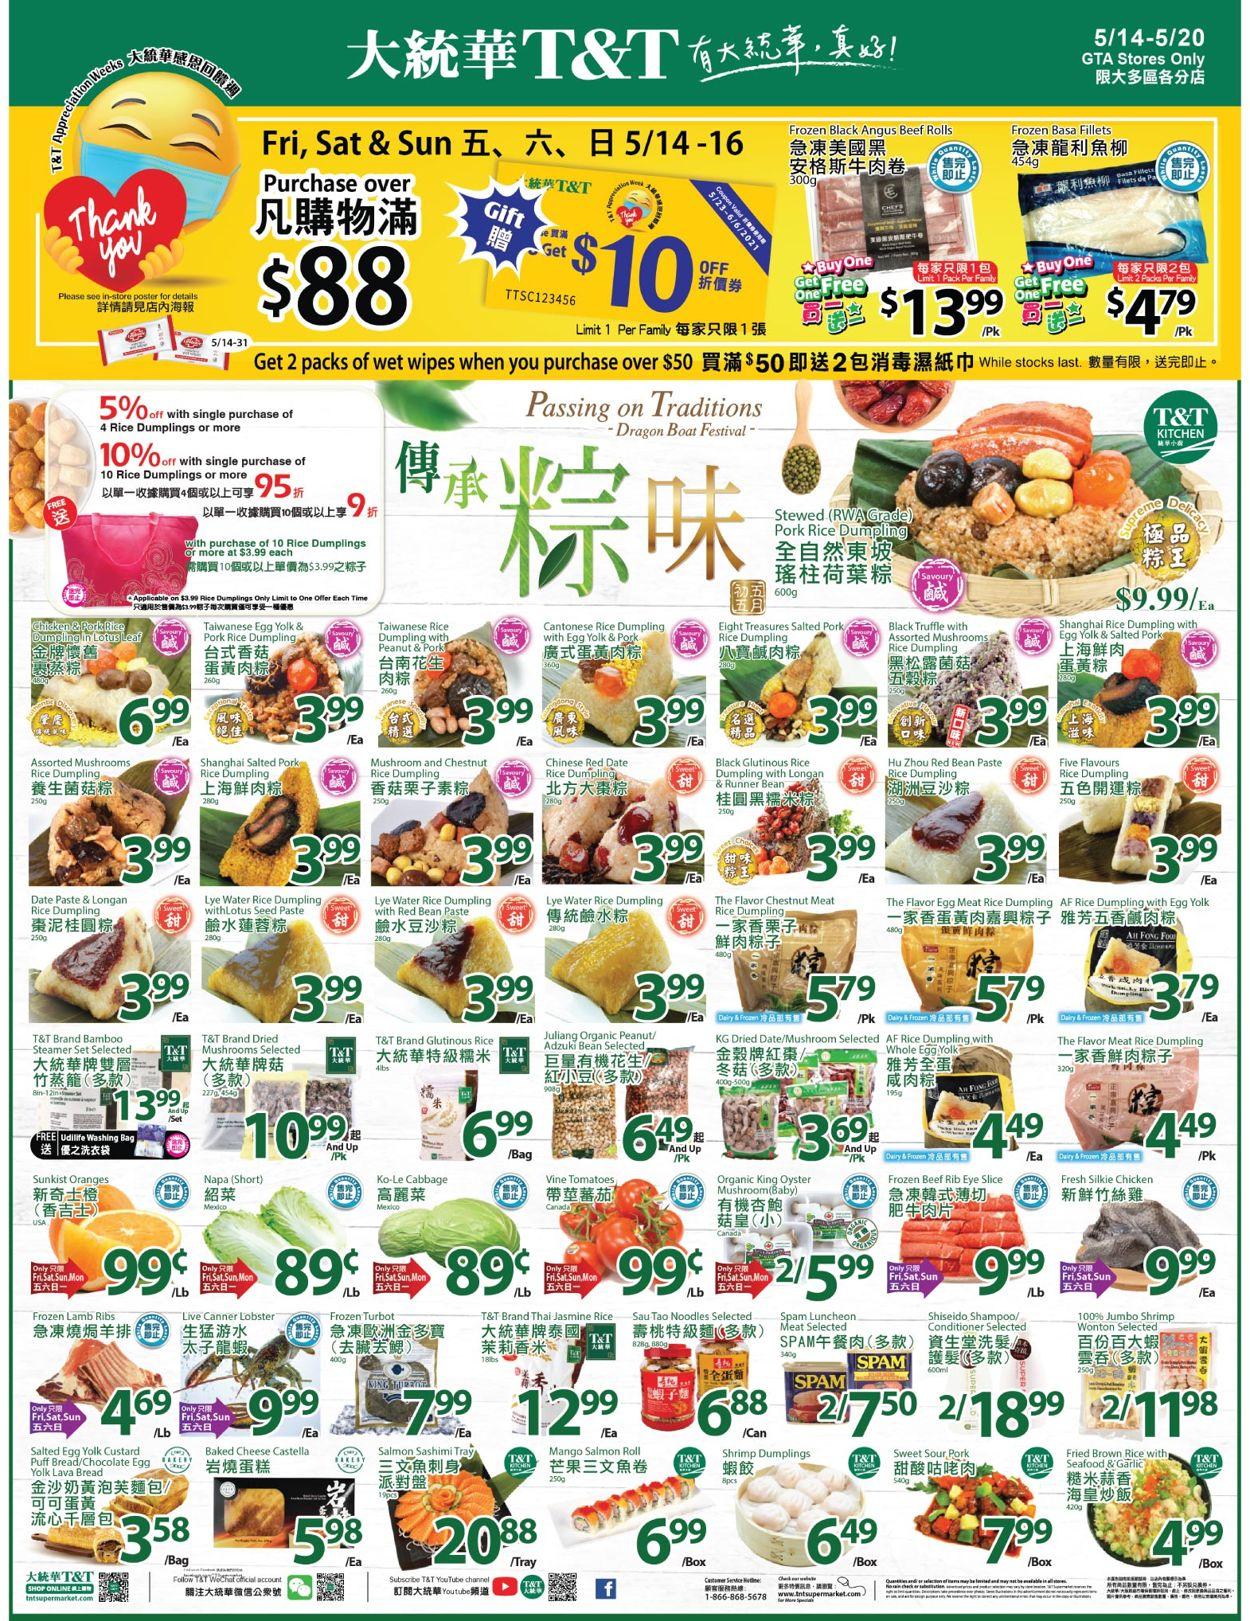 T&T Supermarket - Greater Toronto Area Flyer - 05/14-05/20/2021